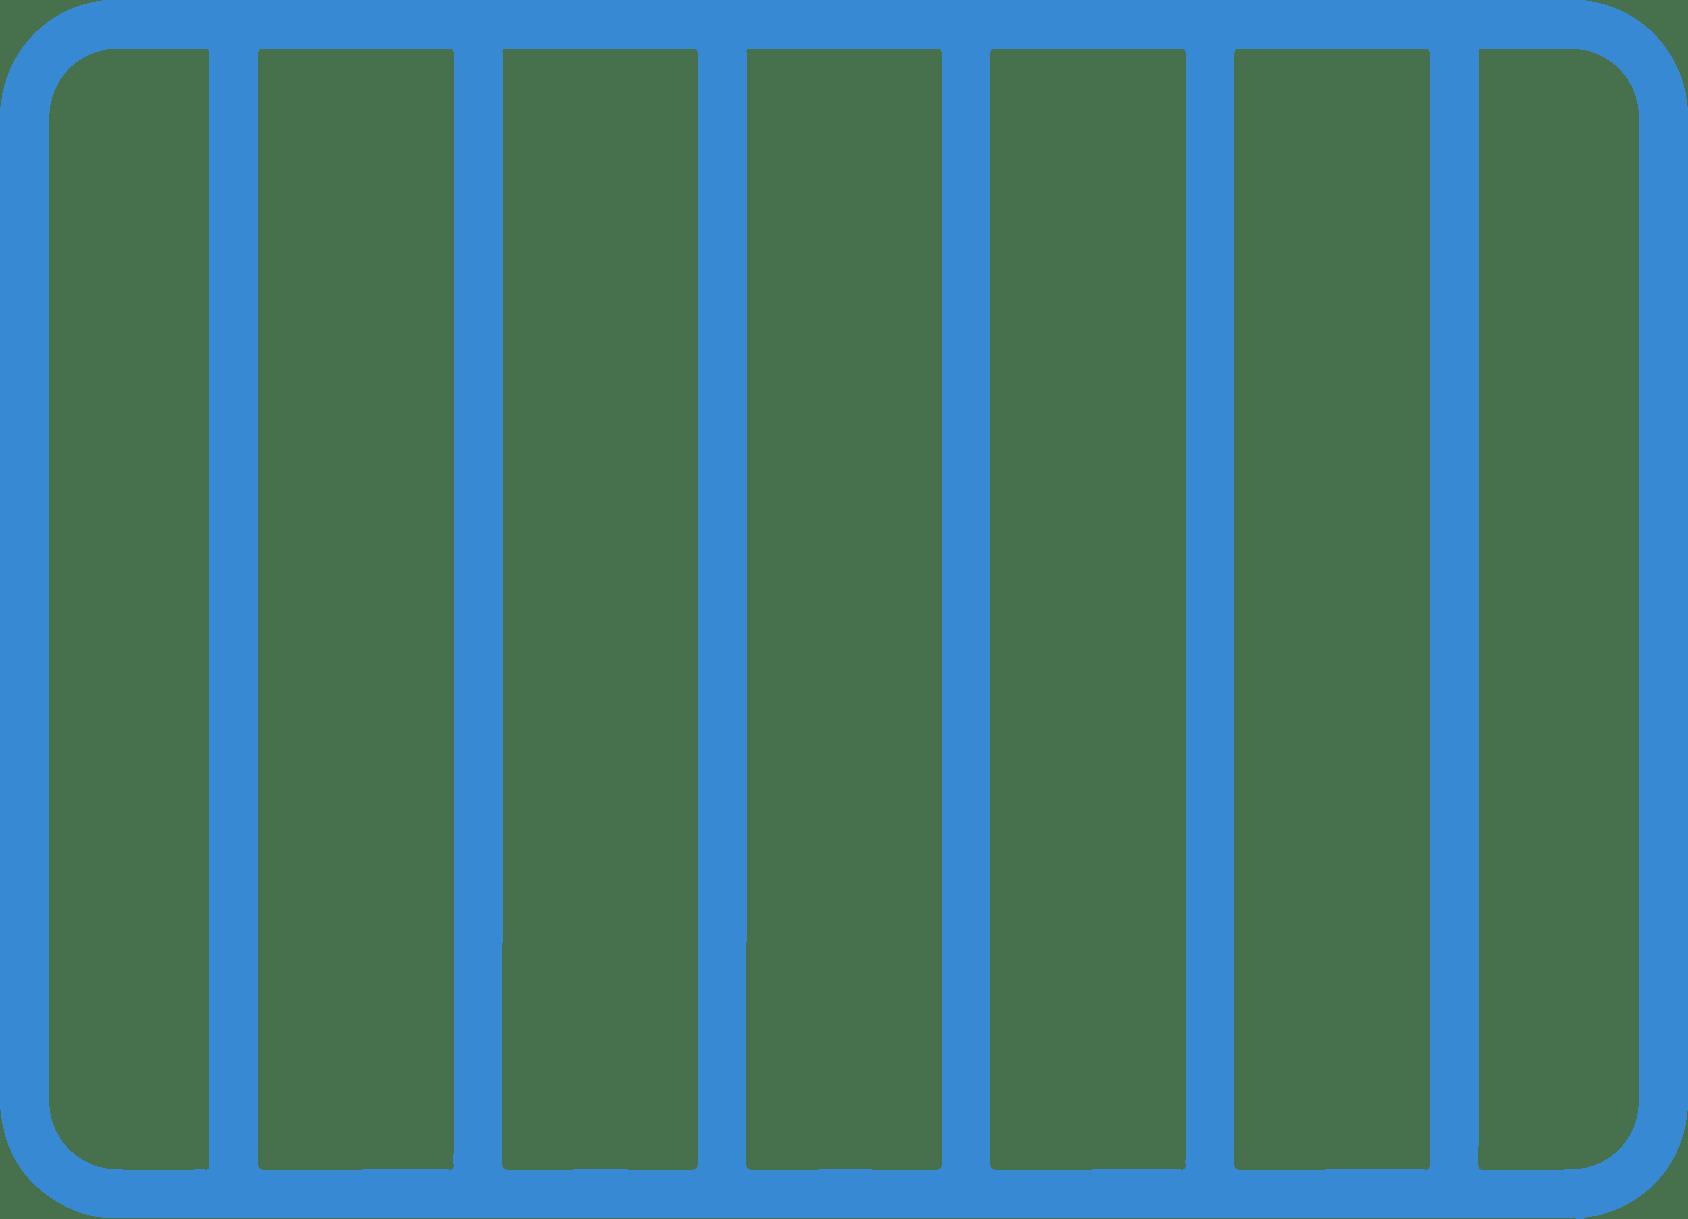 prison bar.png